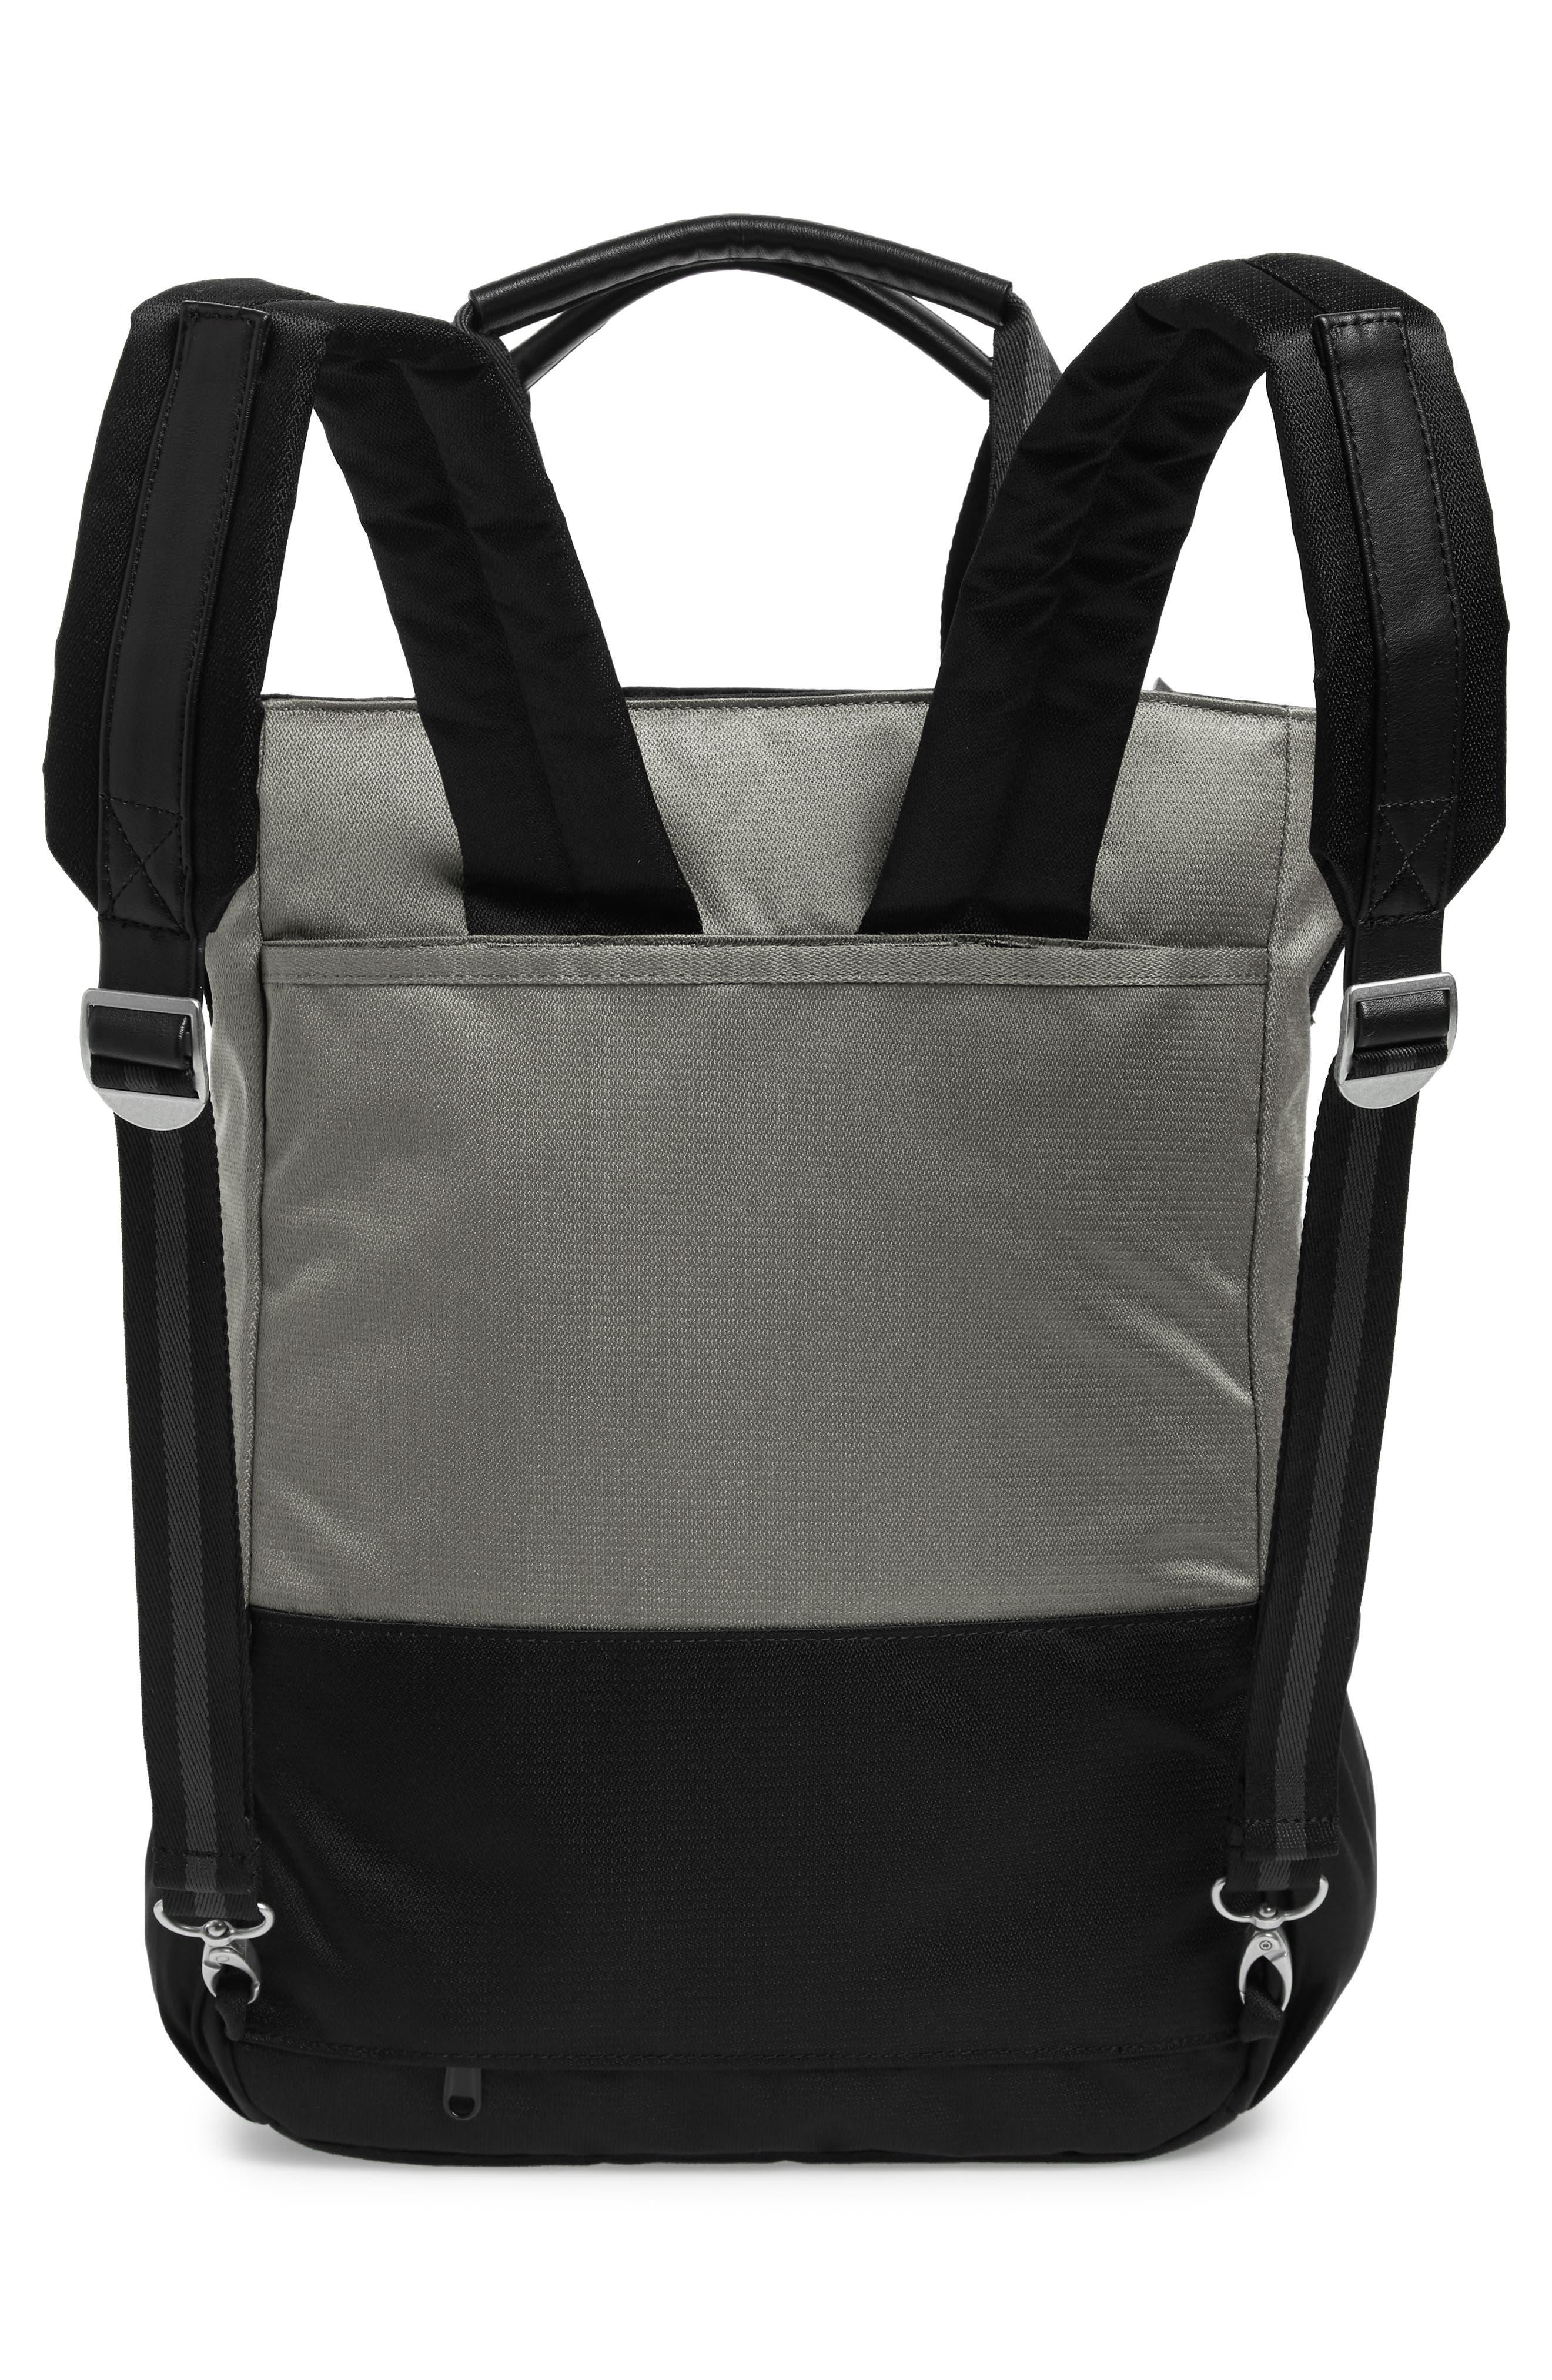 Camden RFID Convertible Backpack,                             Alternate thumbnail 5, color,                             GREY FLINT/ BLACK